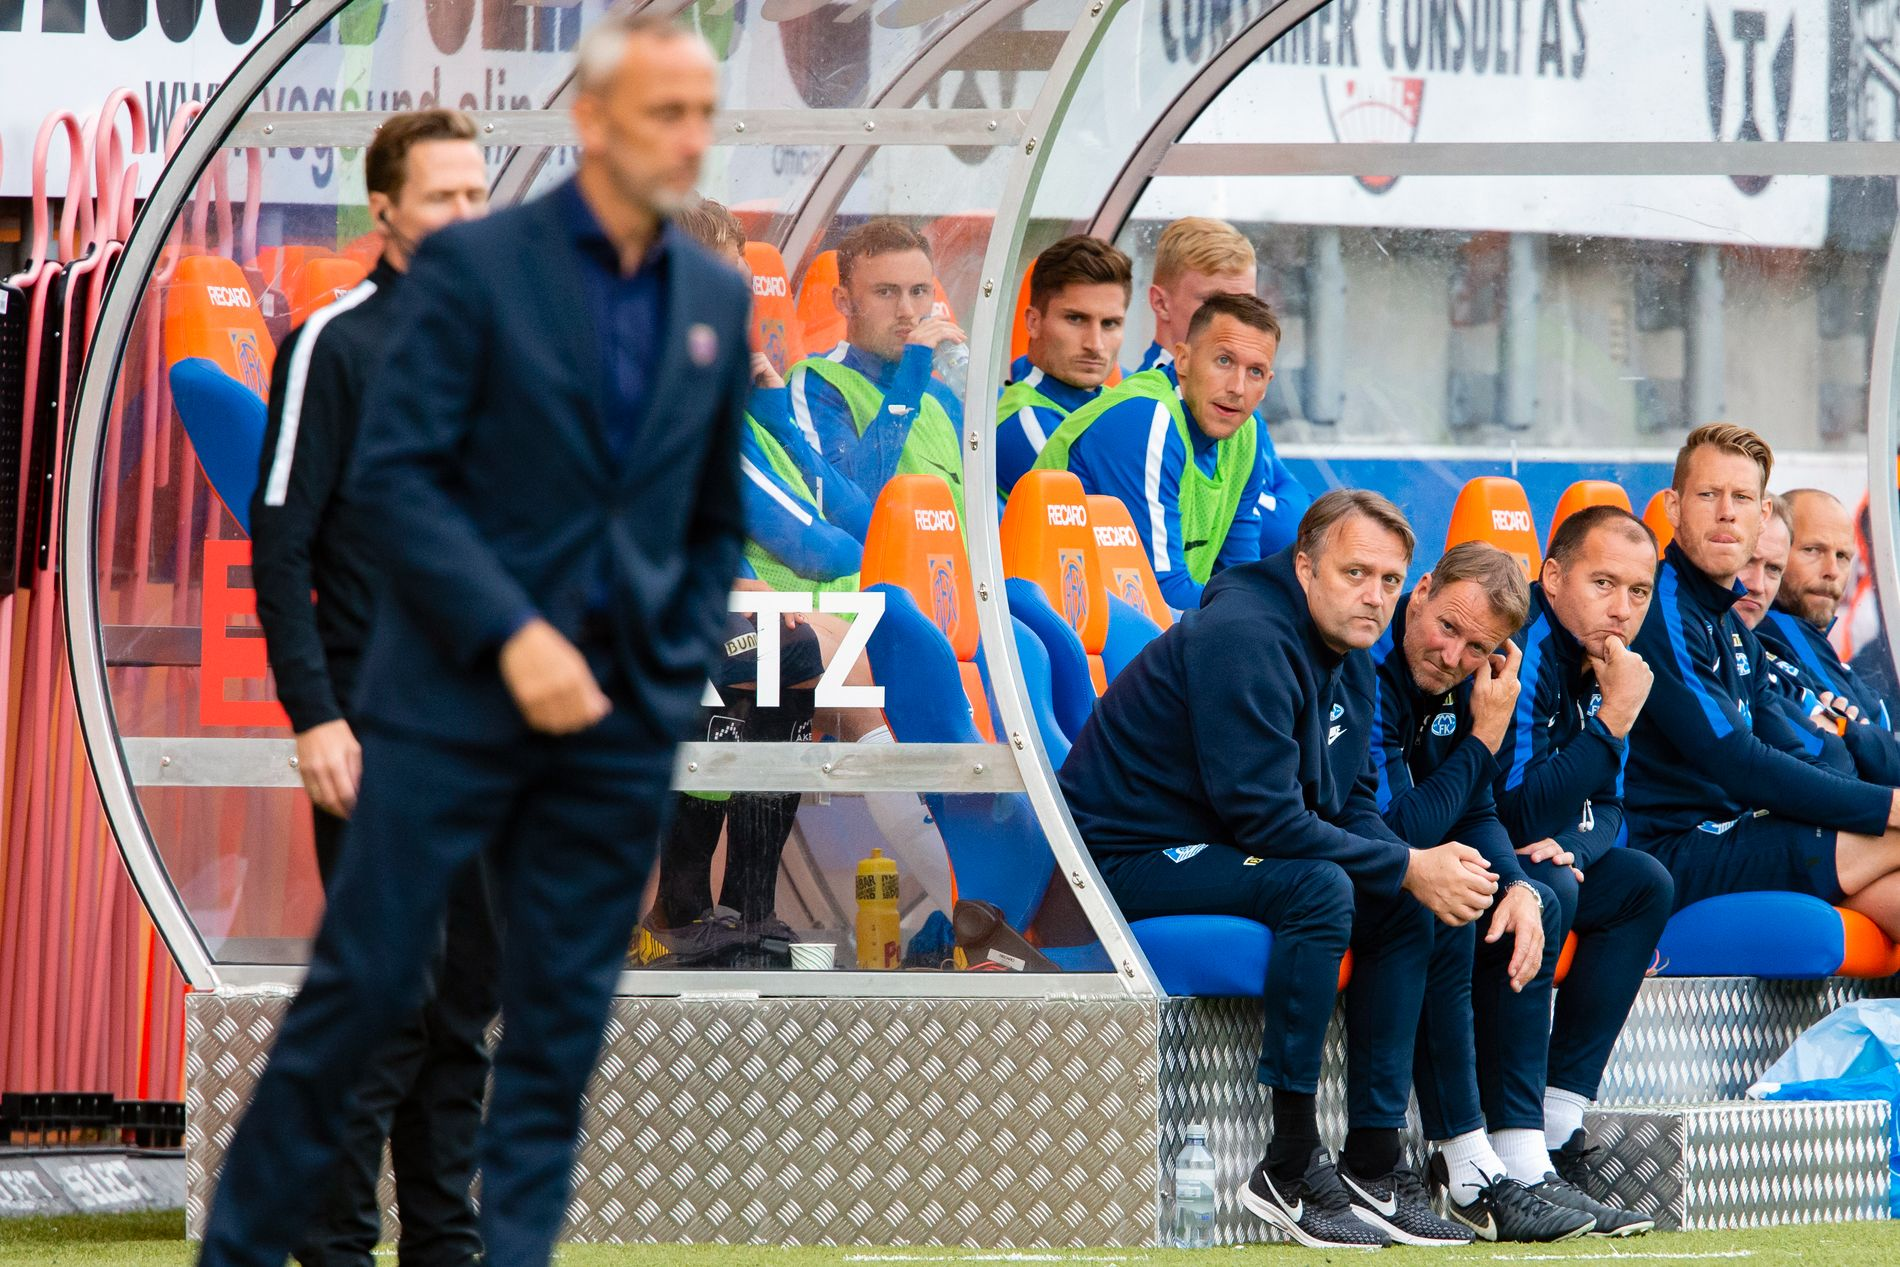 MOLDE-BENKEN: Mens Lars Bohinen styrer Aalesund sitter blant andre Erling Moe (trener), Trond Strande (assistent), Per Magne Misund (keepertrener) og Børre Steenslid (fysisk trener) på Molde-benken.